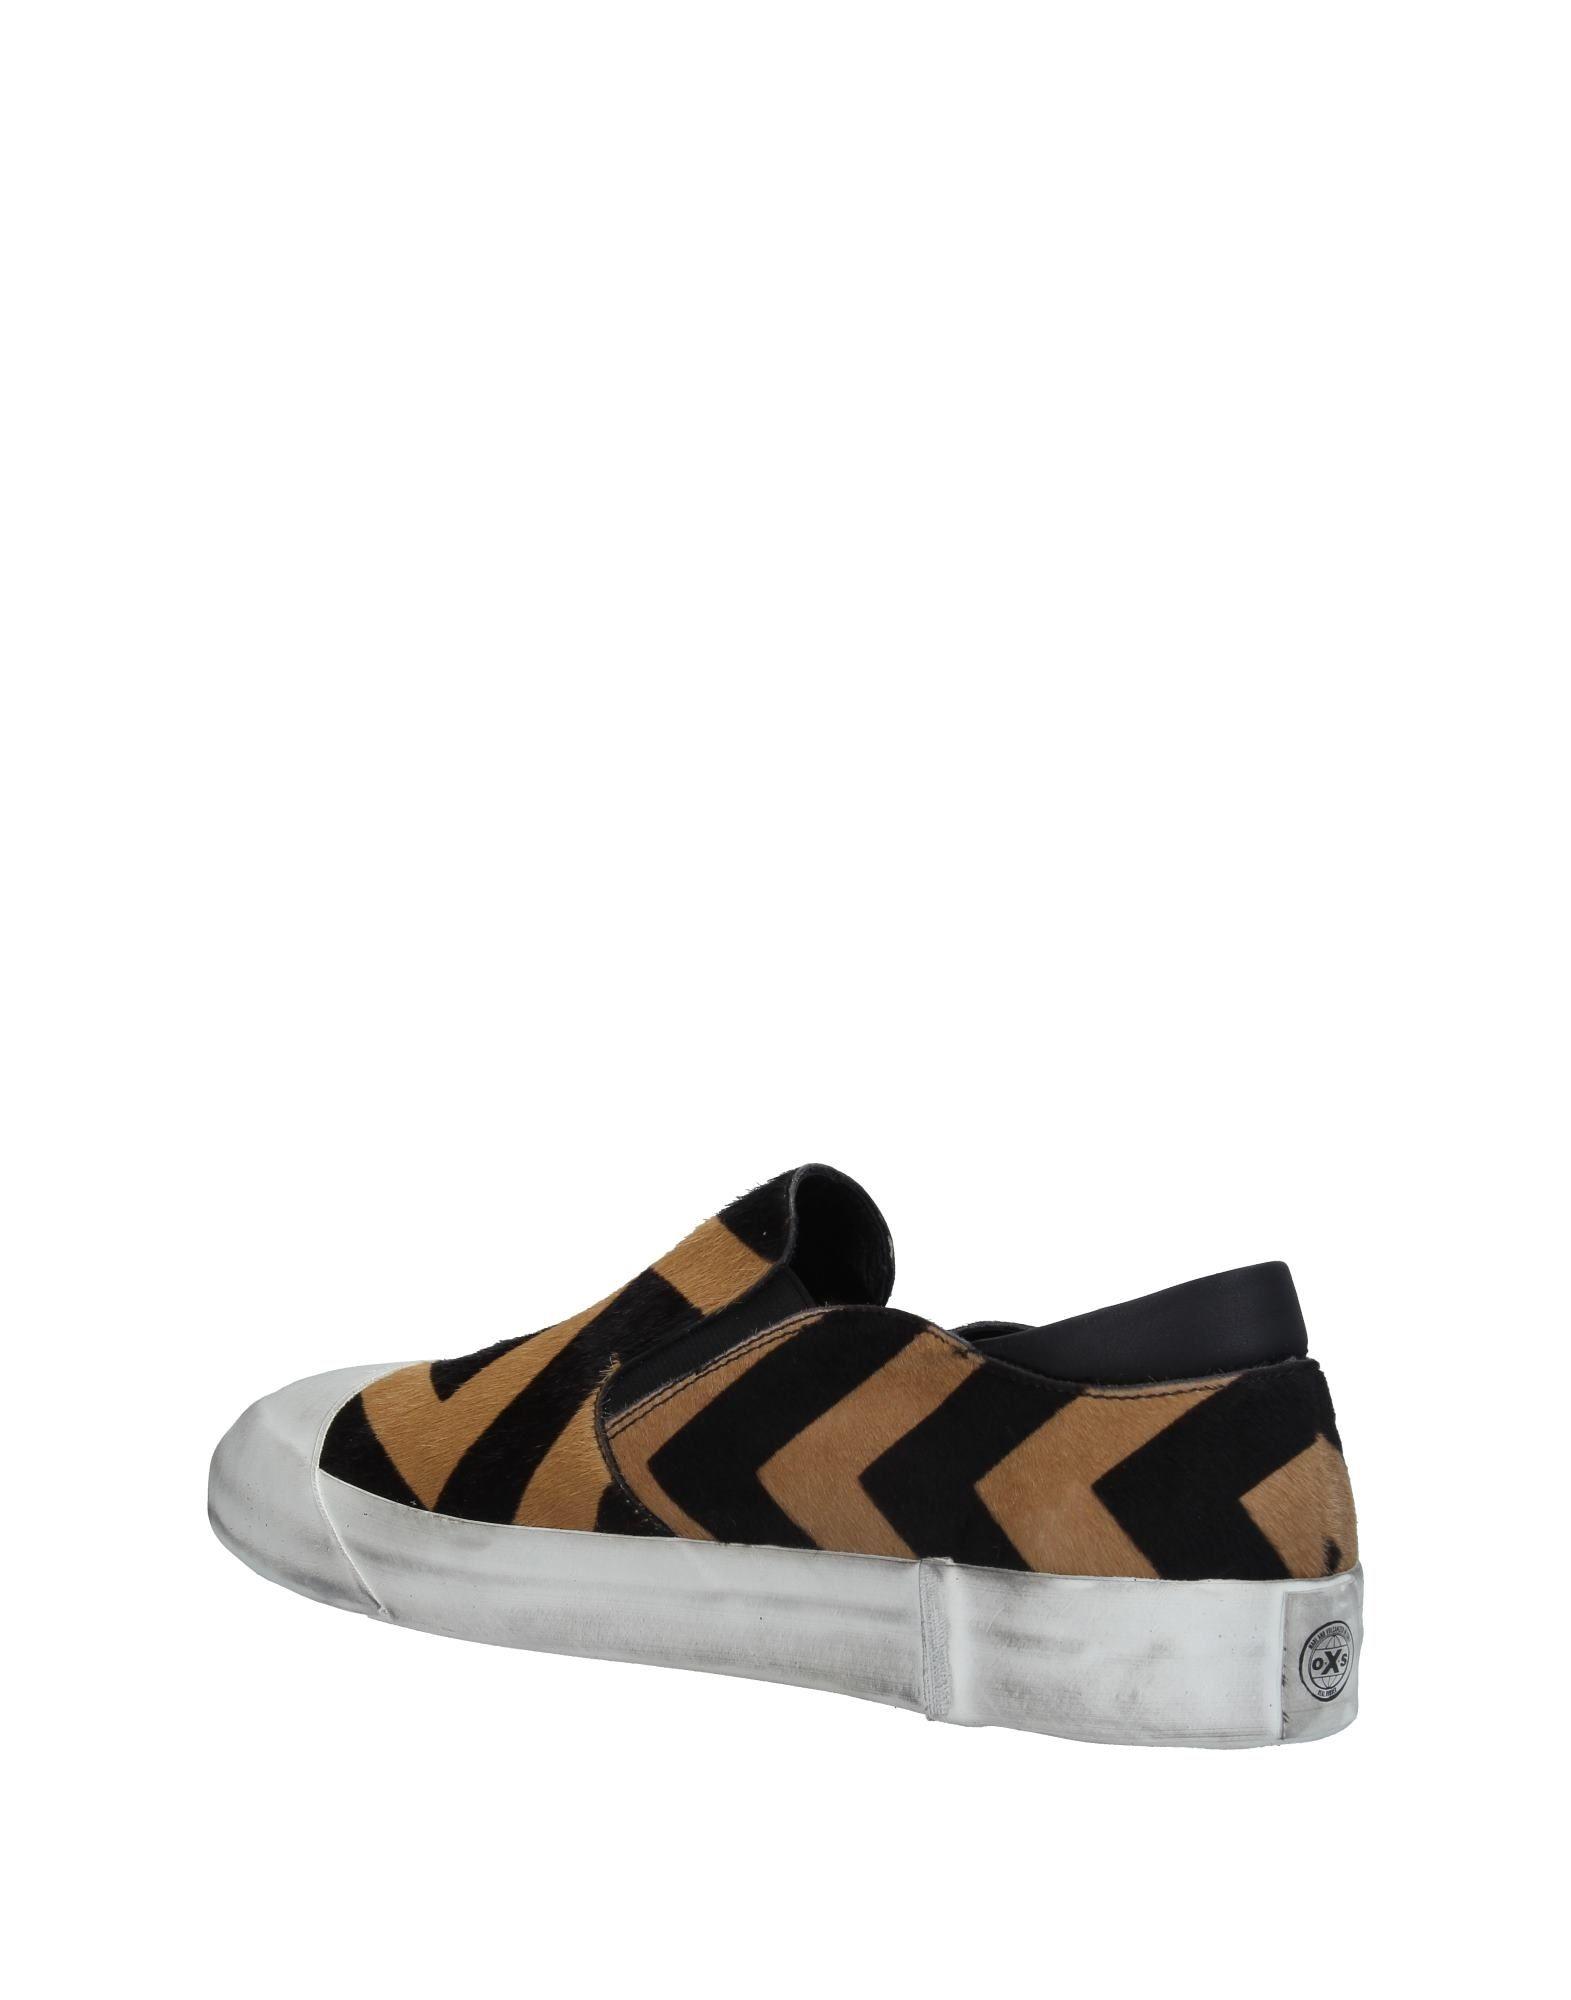 O.X.S. Sneakers Sneakers Sneakers Herren  11314570TP Heiße Schuhe 8631aa